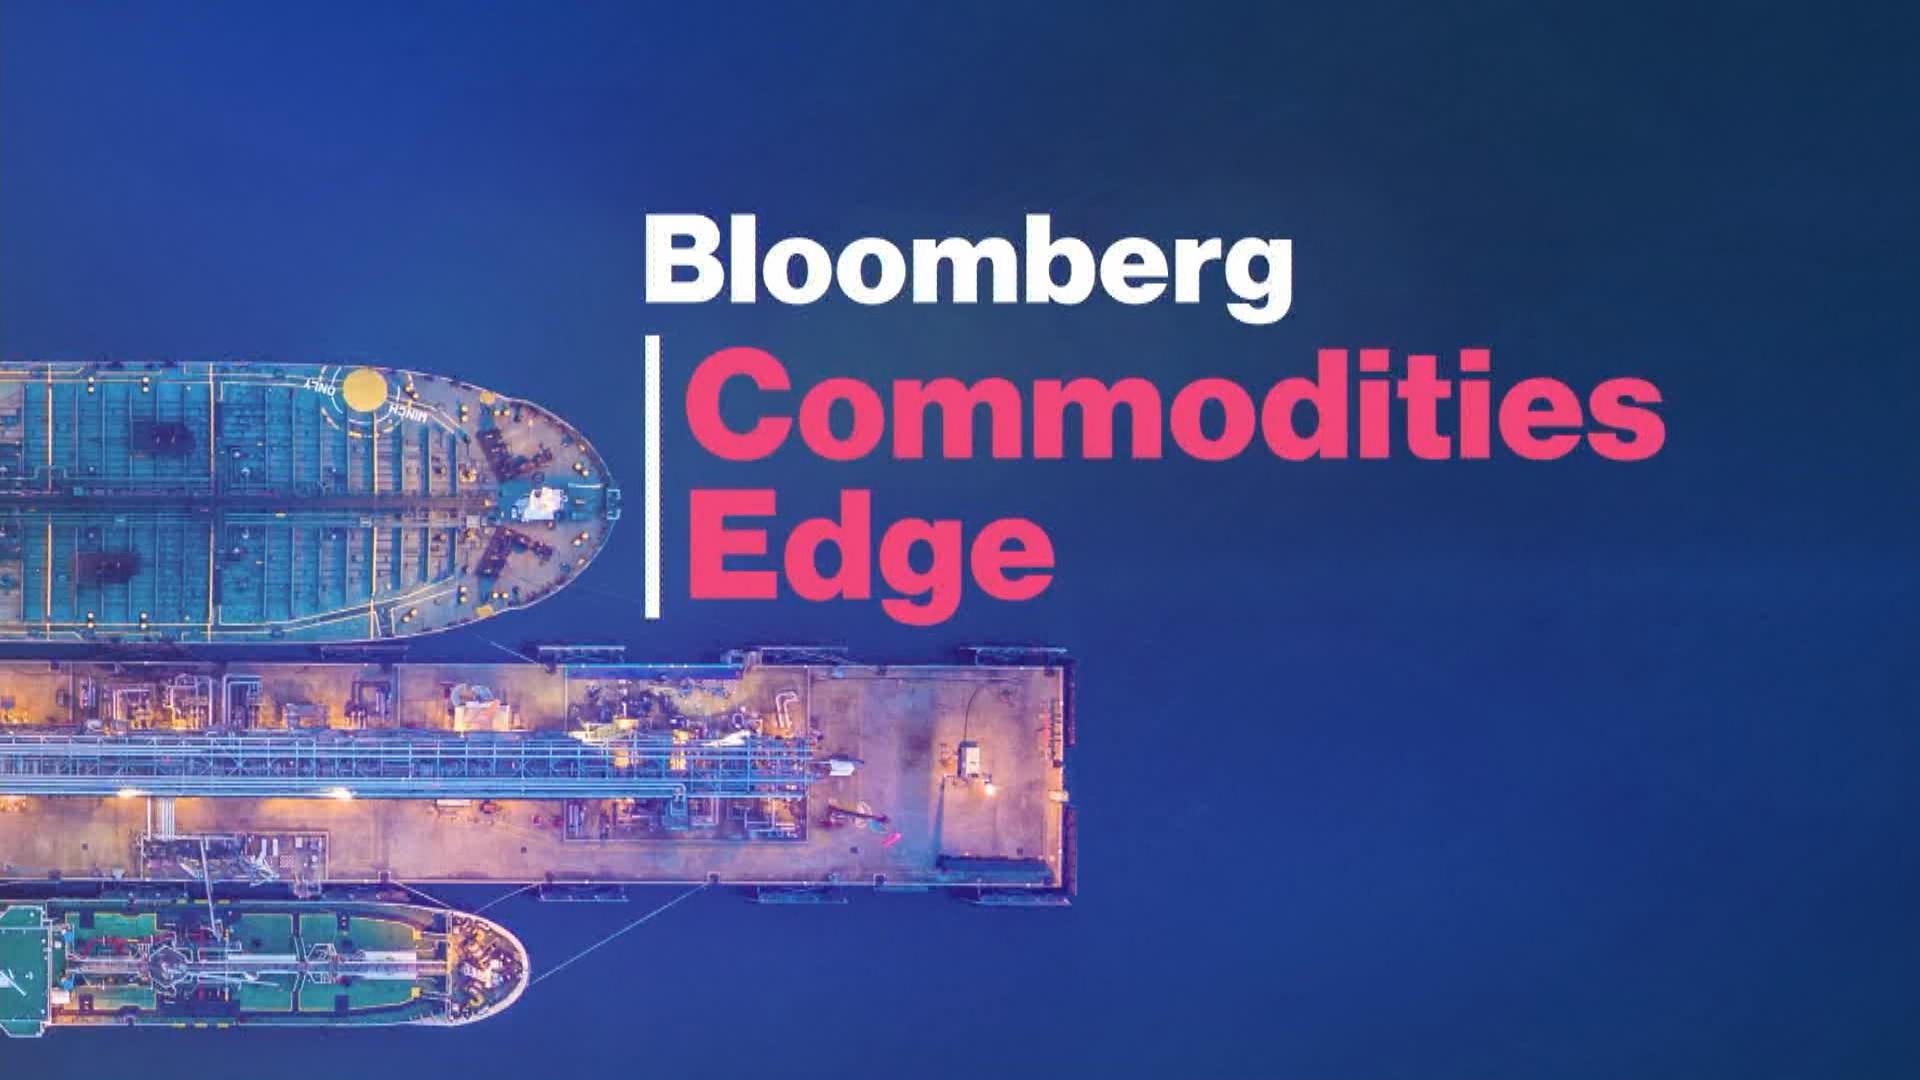 'Bloomberg Commodities Edge' Full Show (02/21/2019)